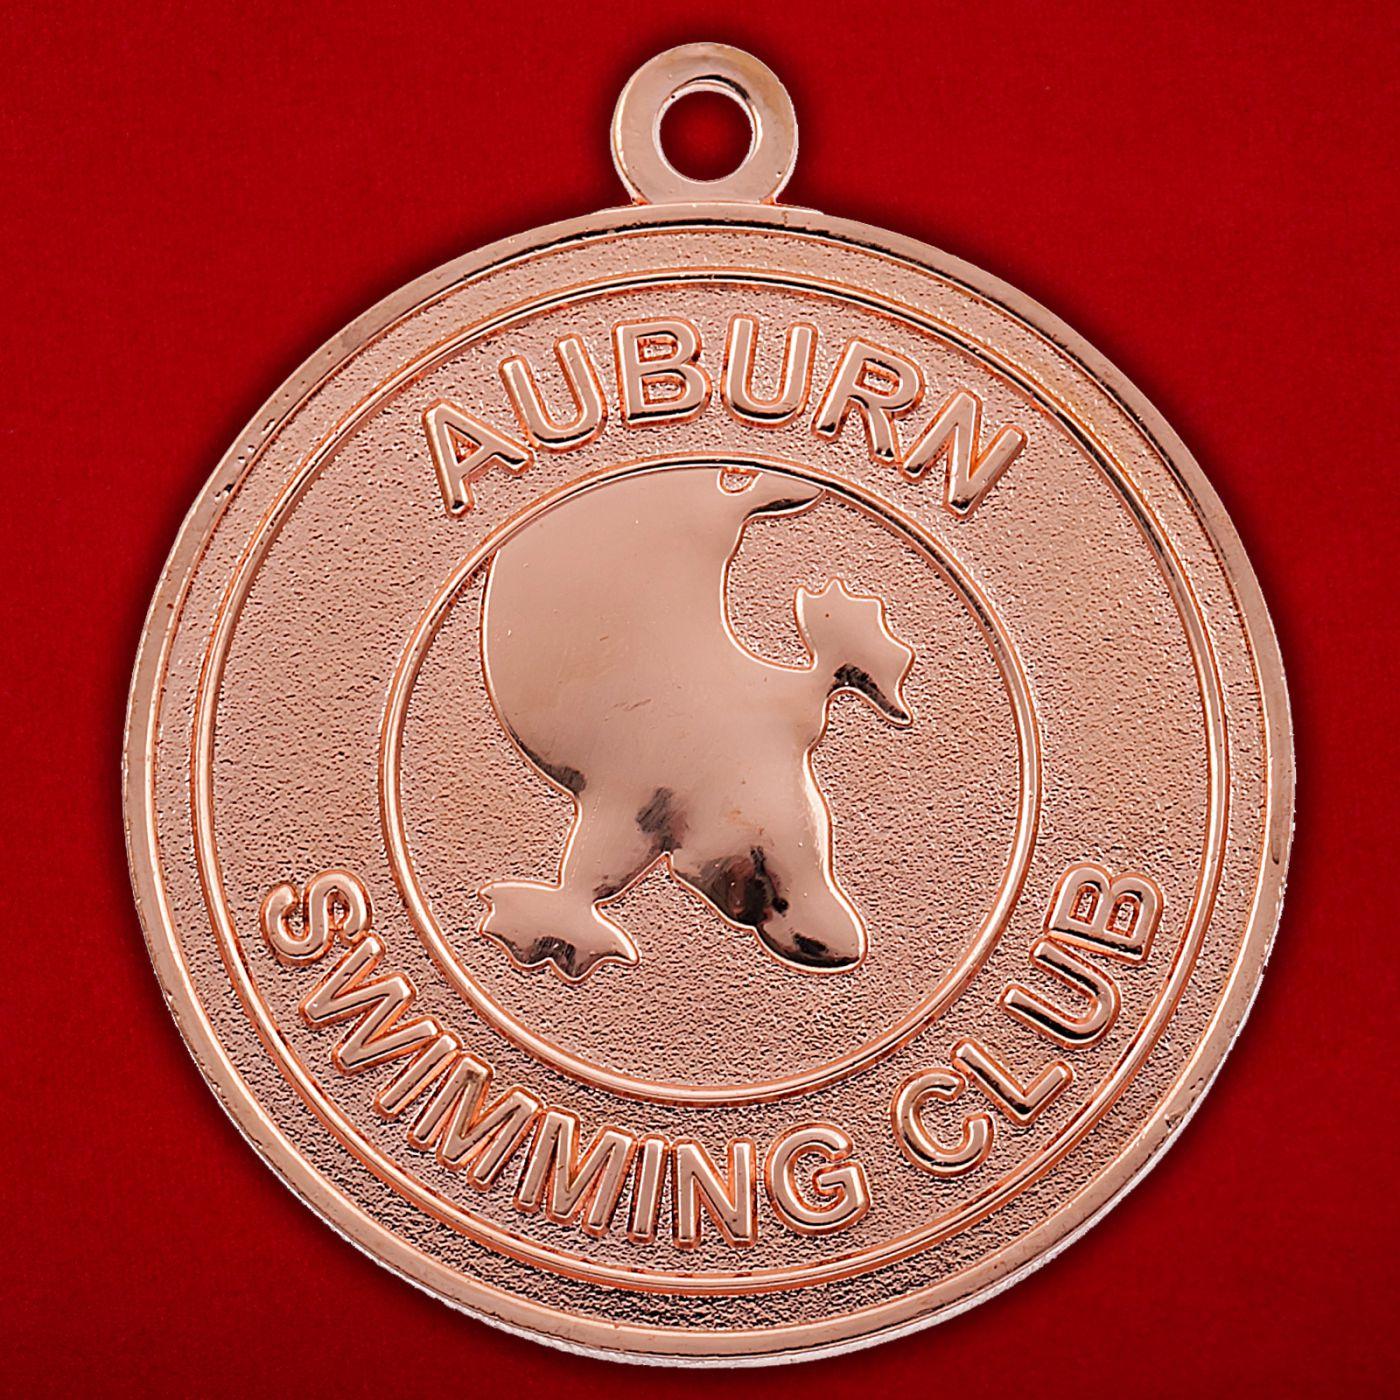 Медальон пловцов города Эйбурна, Австралия